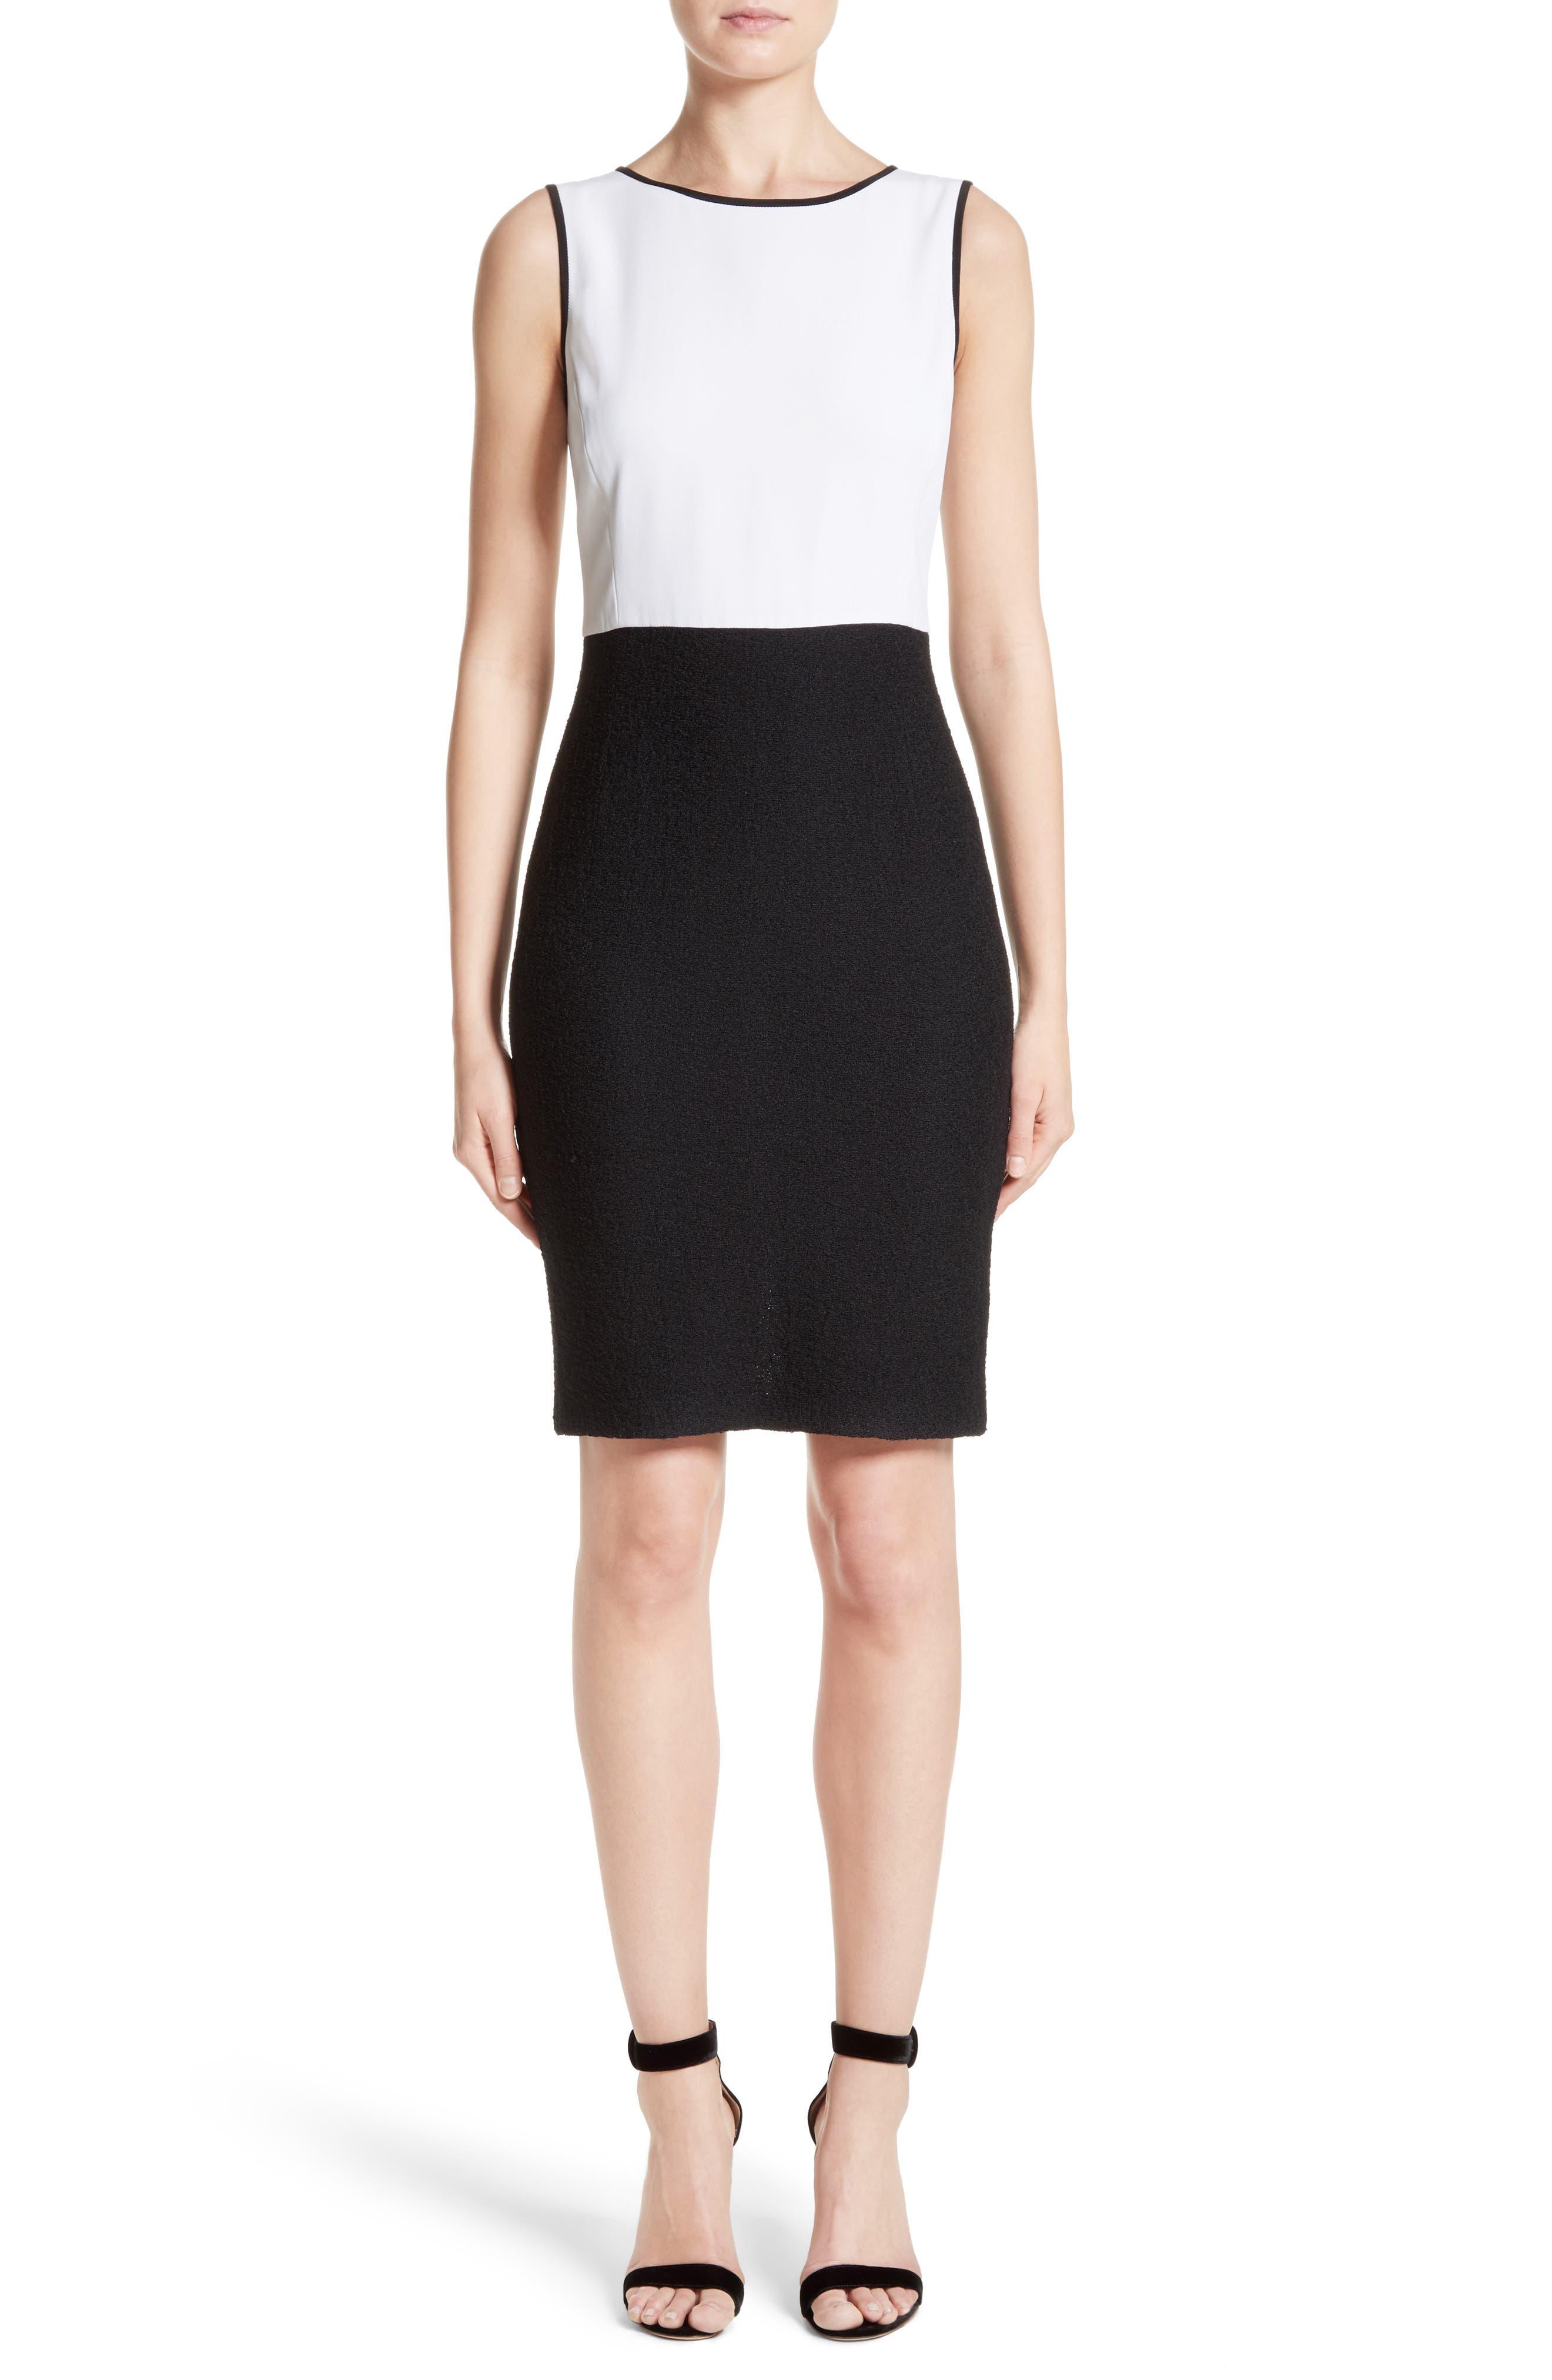 Cady Bodice Clair Knit Dress,                             Main thumbnail 1, color,                             Bianco/ Caviar